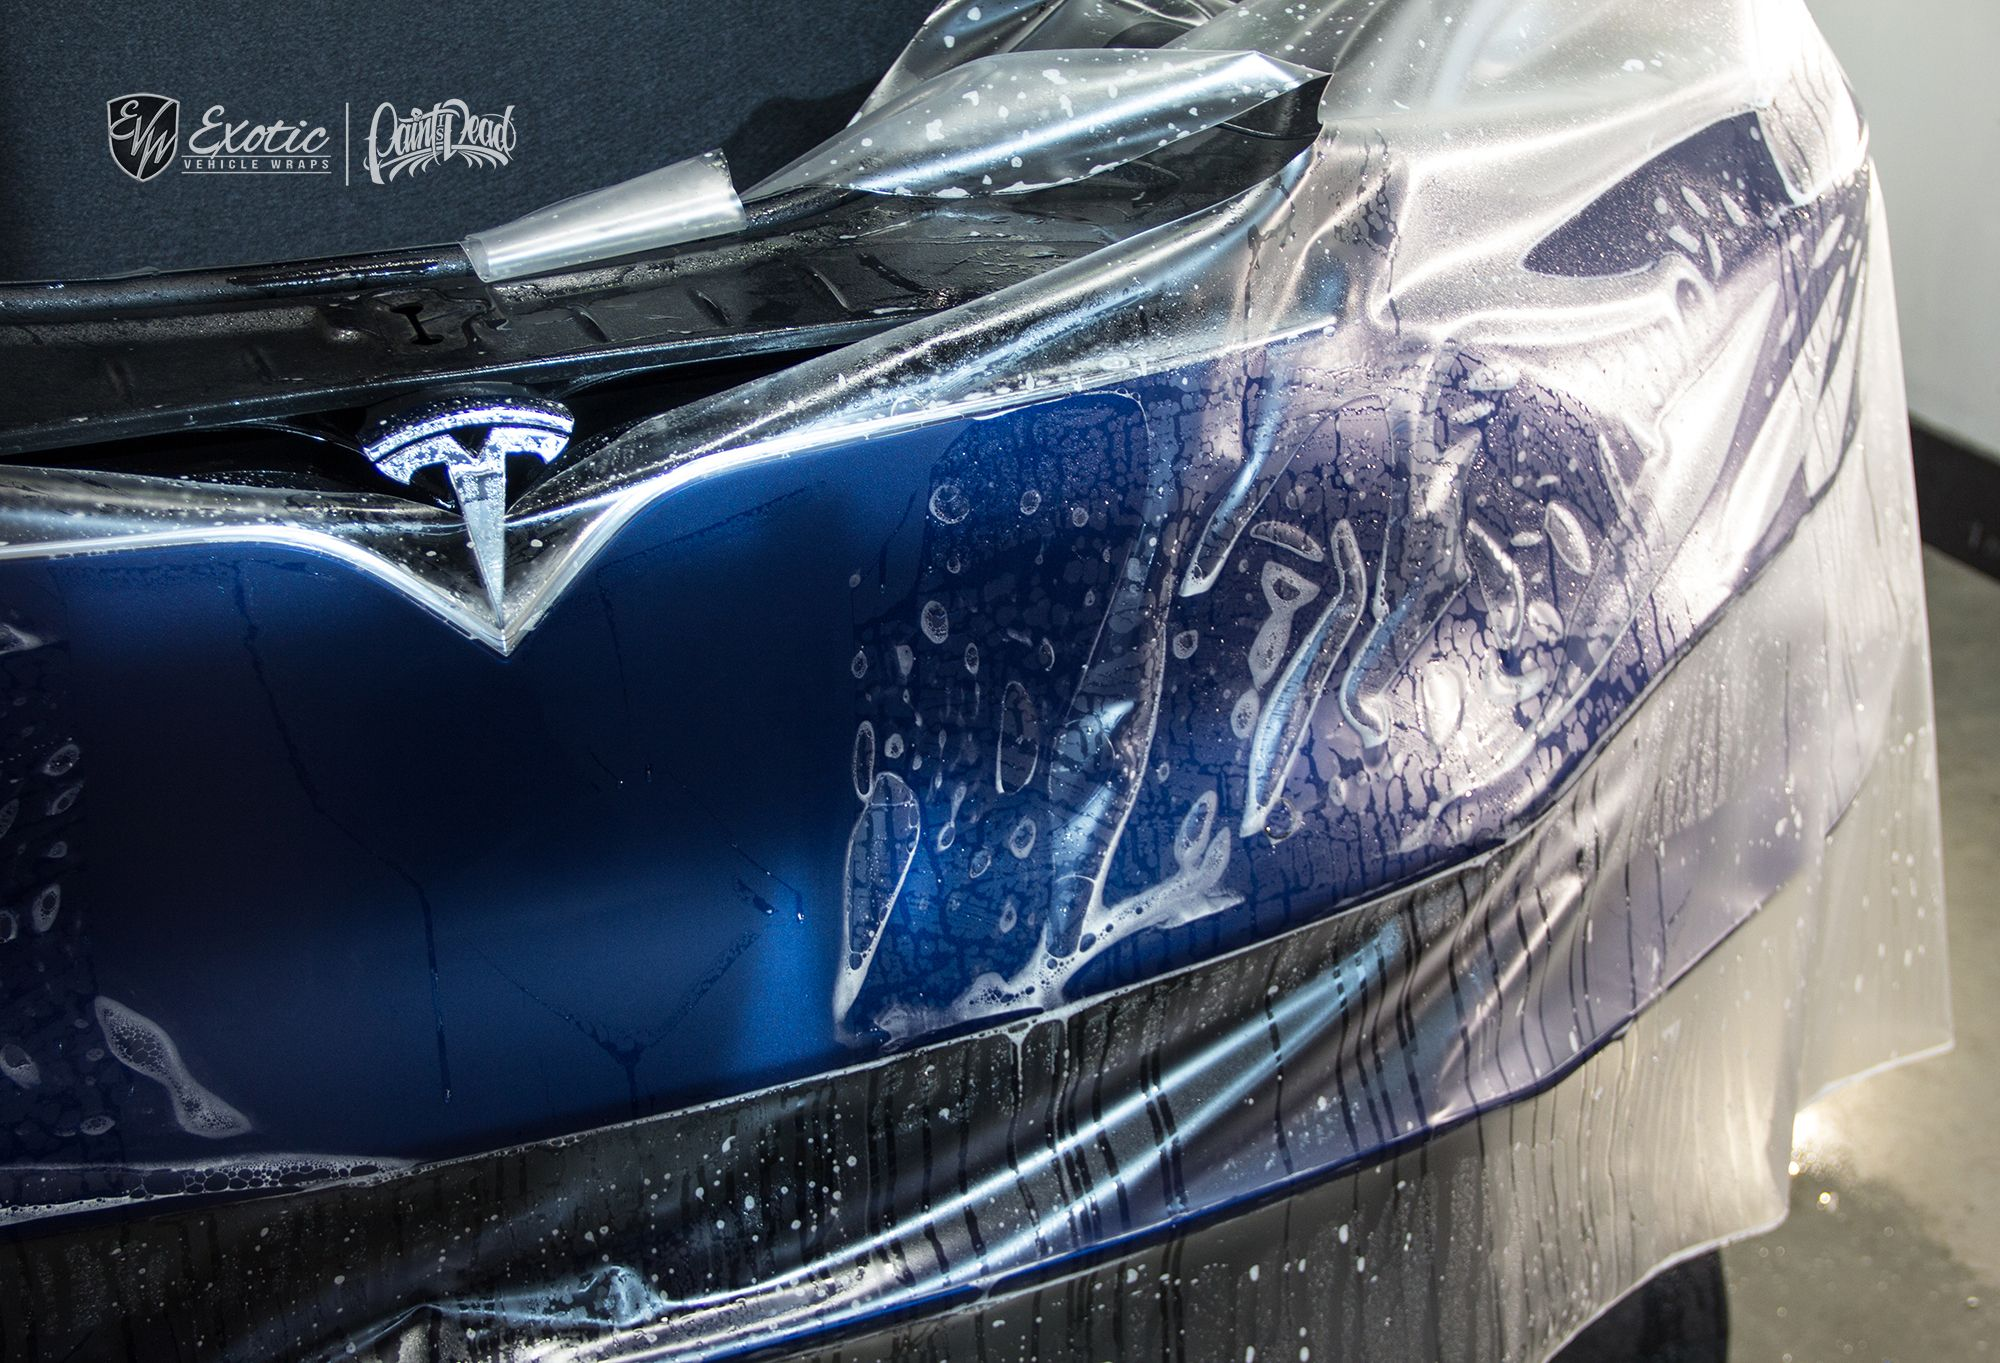 Model S Deep Blue Metallic With Xpel Stealth Ceramic Pro Tesla Models Car Automotive Cars Autos Stealth Deep Blue Tesla Model X